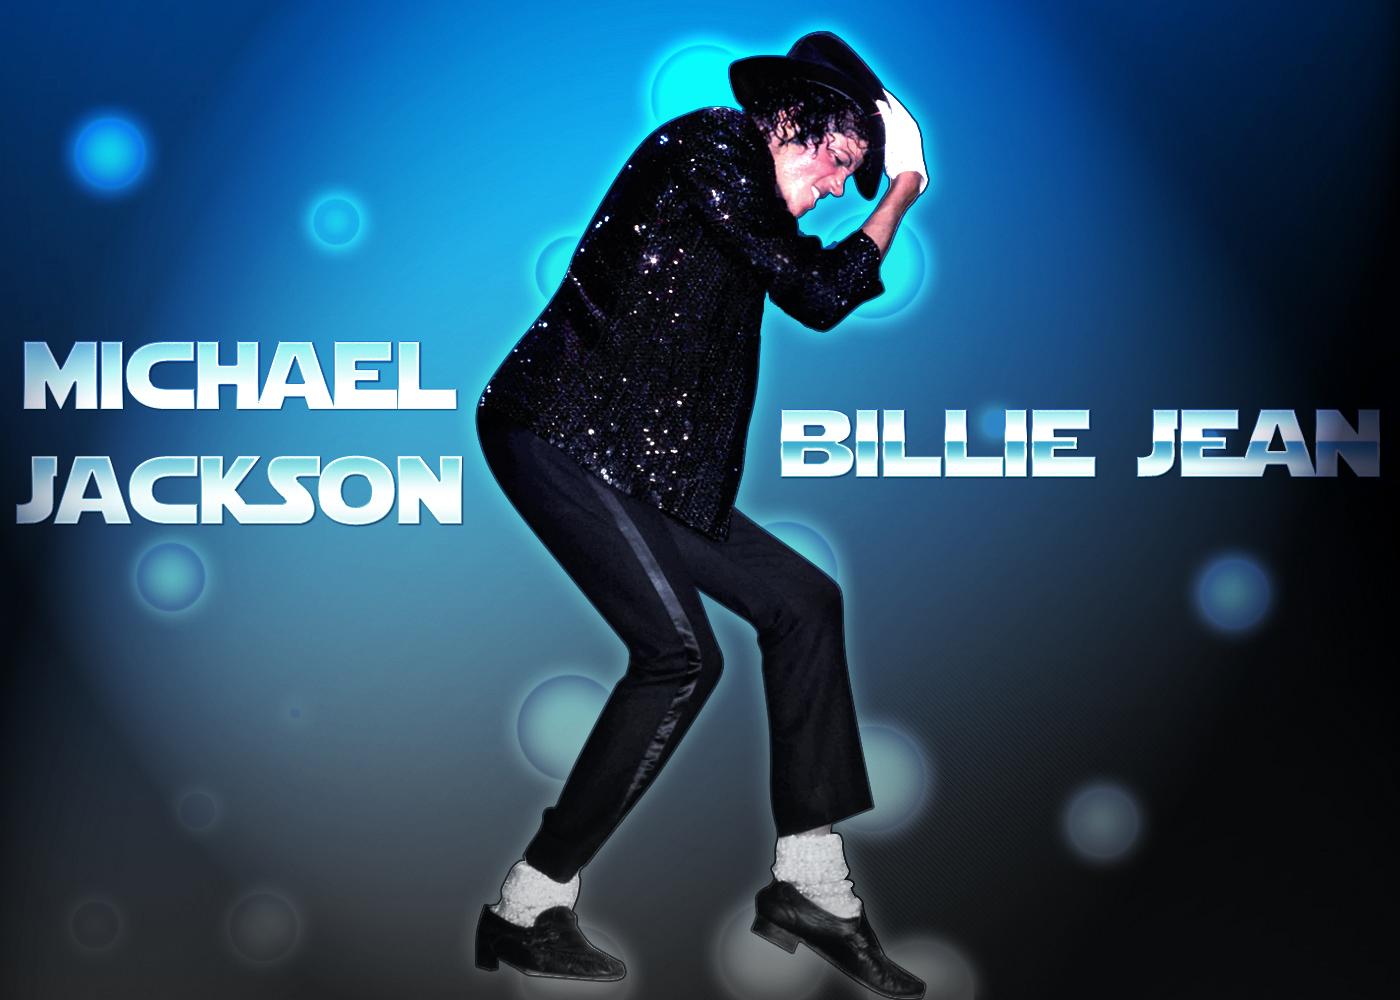 Michael Jackson Billie Jean By Prozdesign On Deviantart